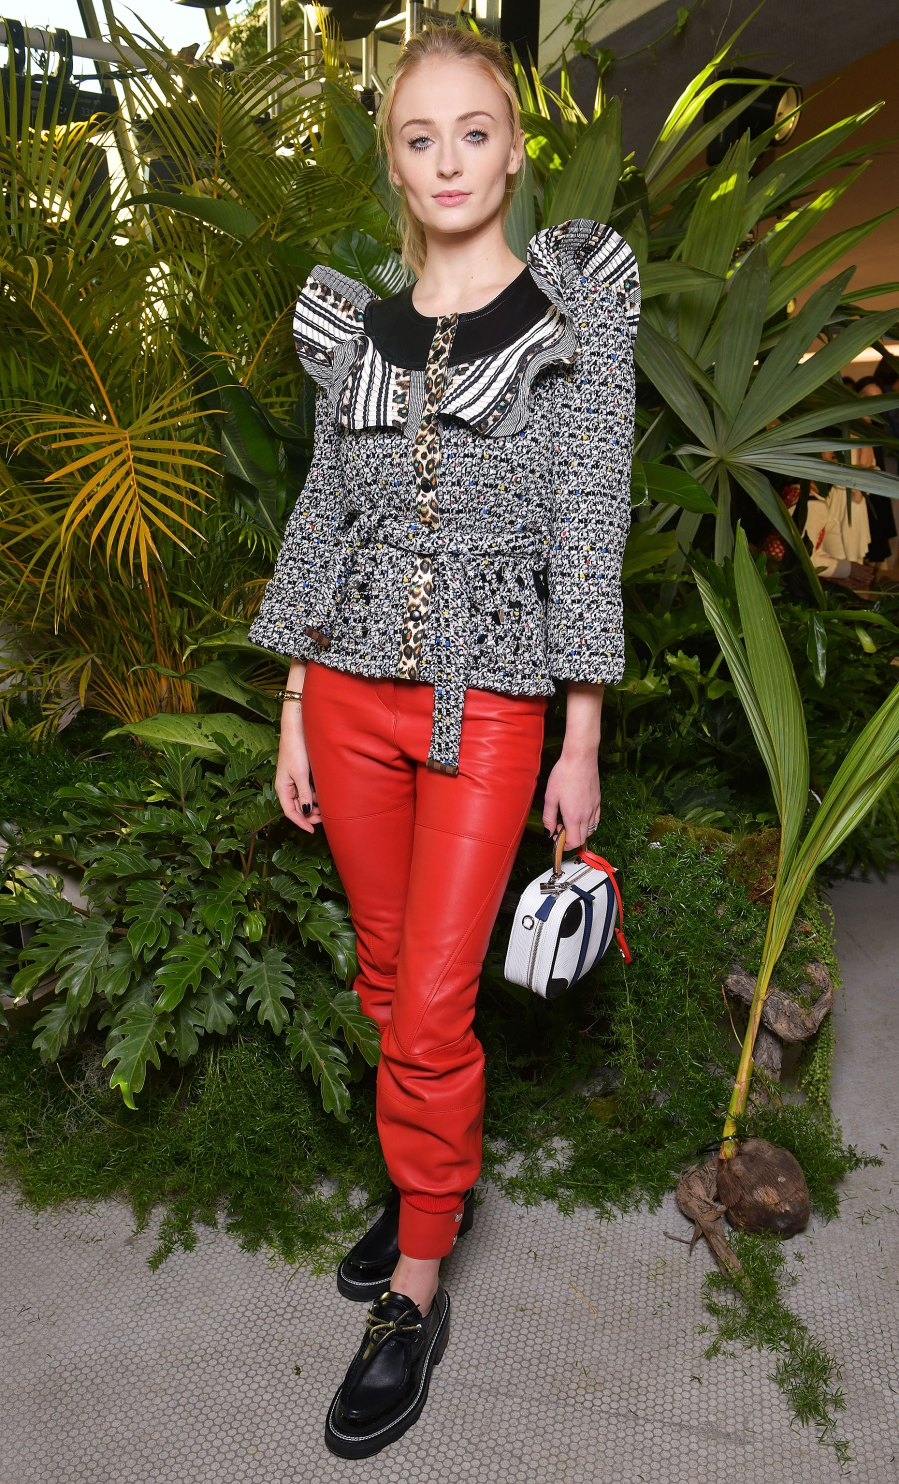 Sophie Turner Louis Vuitton May 8, 2019